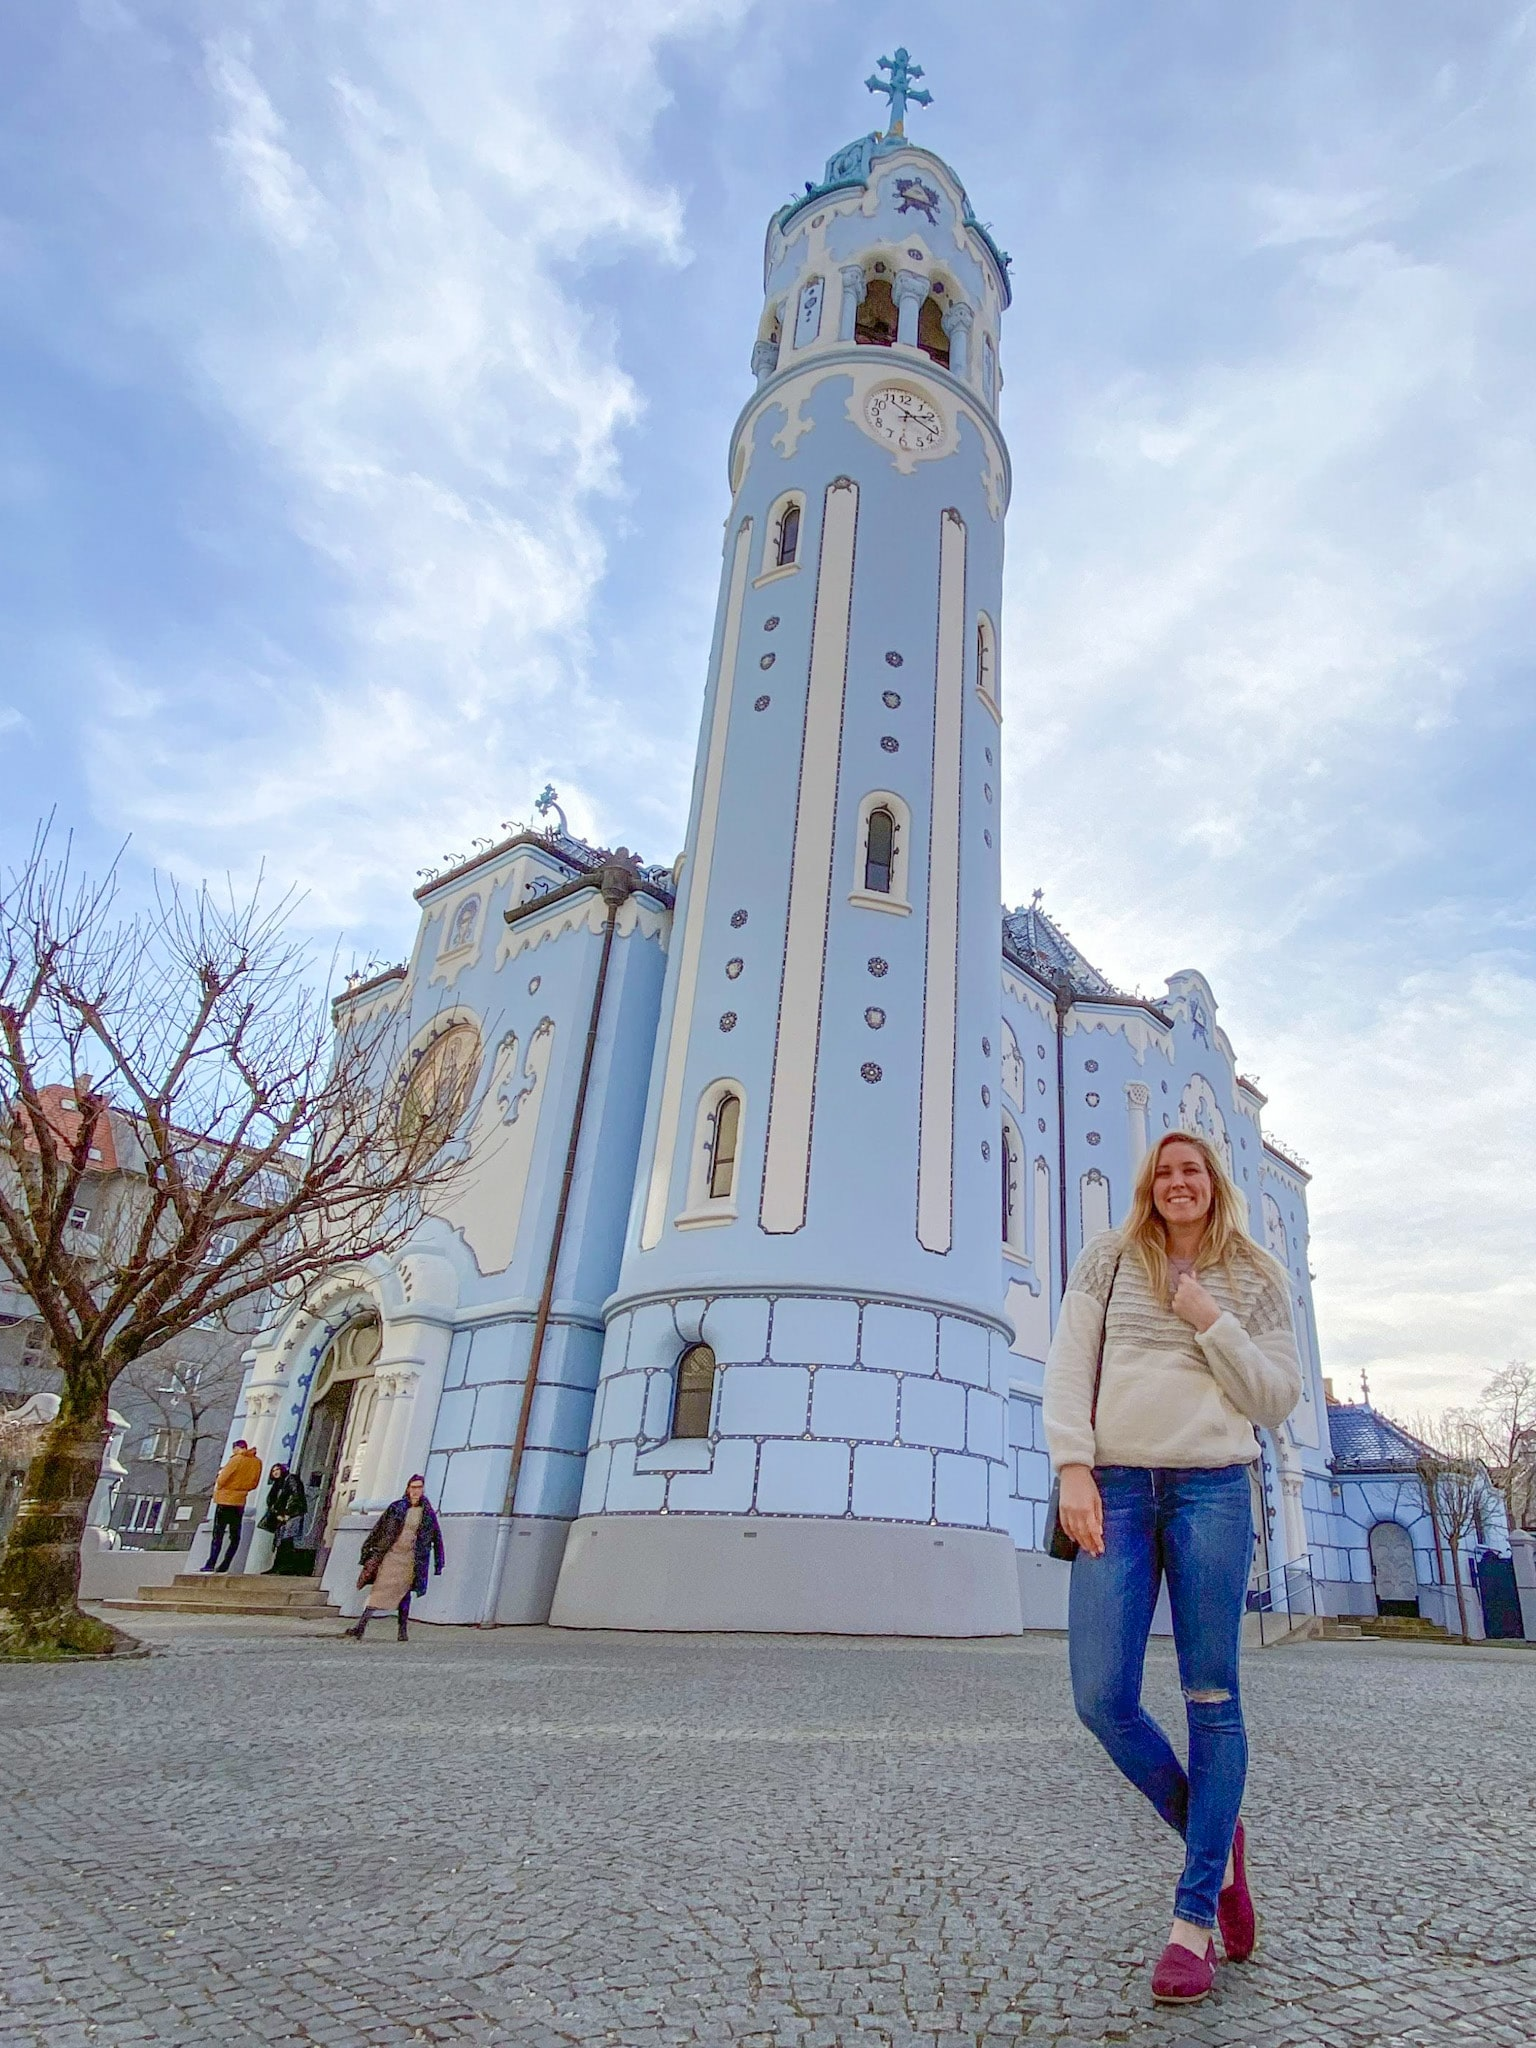 The Blue Church (the Church of St. Elizabeth of Hungary) in Bratislava, Slovakia.